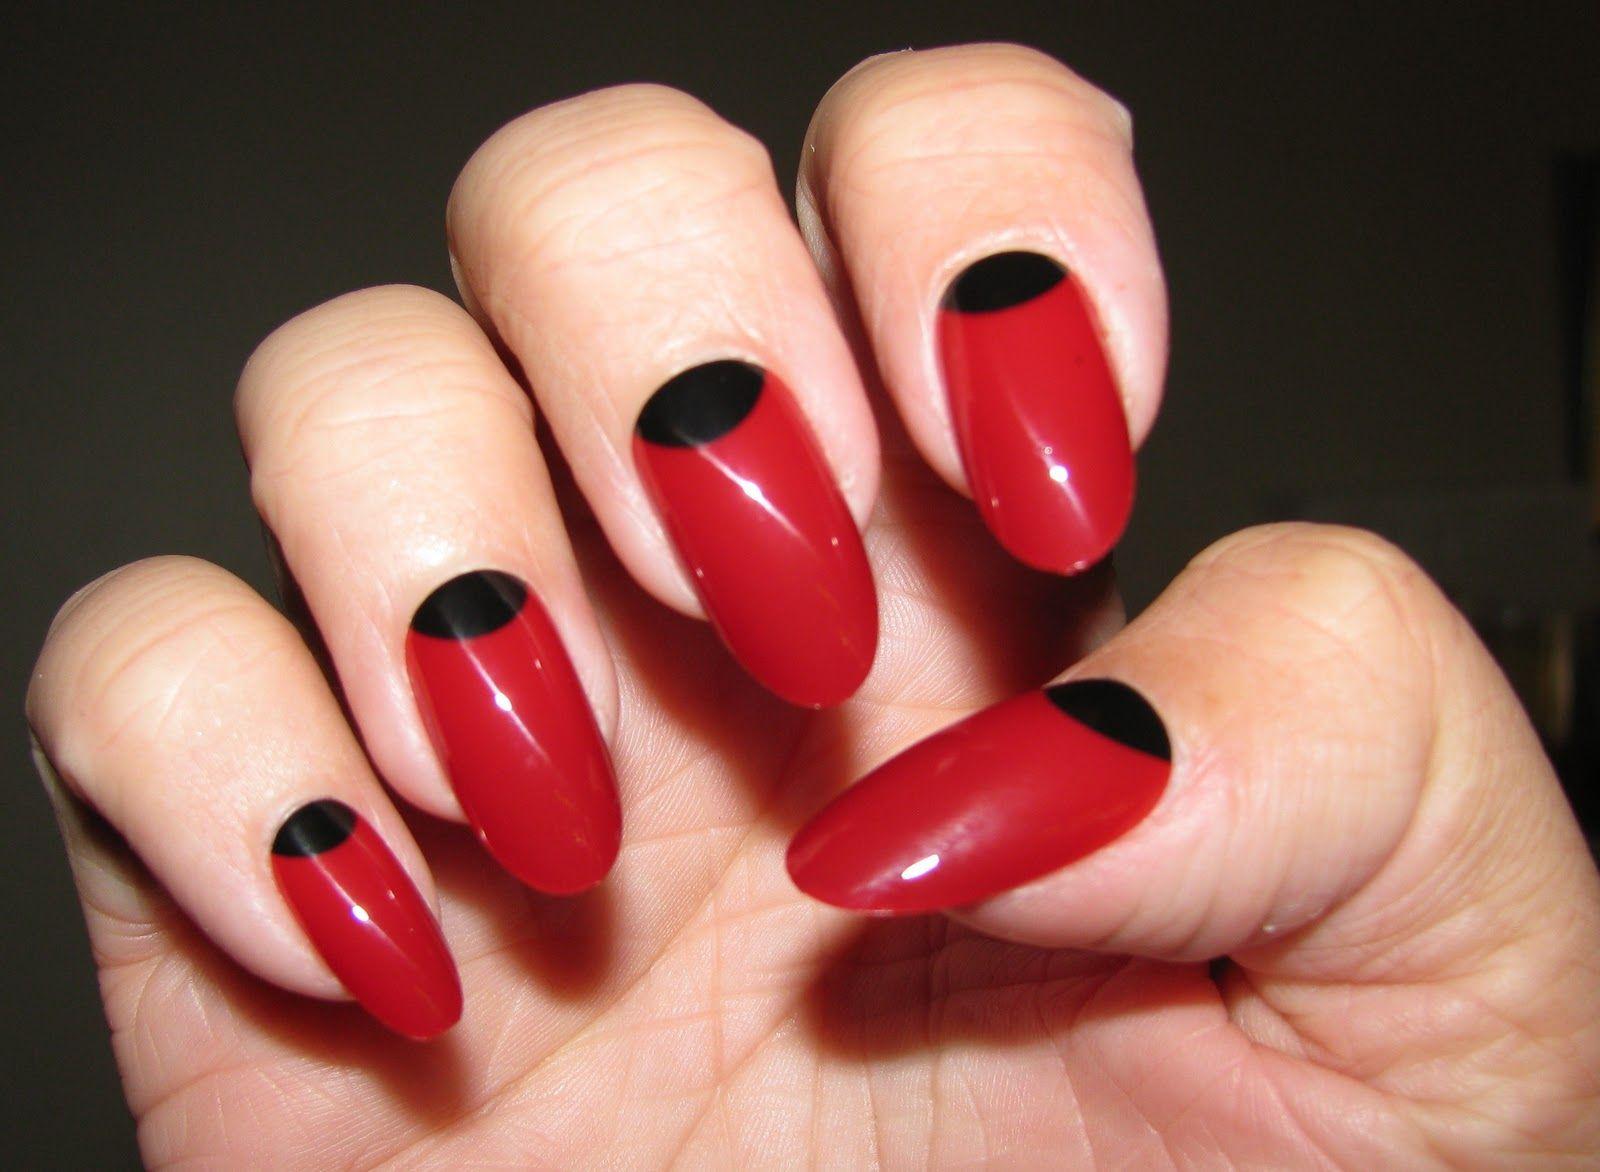 fashion #nails #red #gloss #halfmoon #manicure | beauty